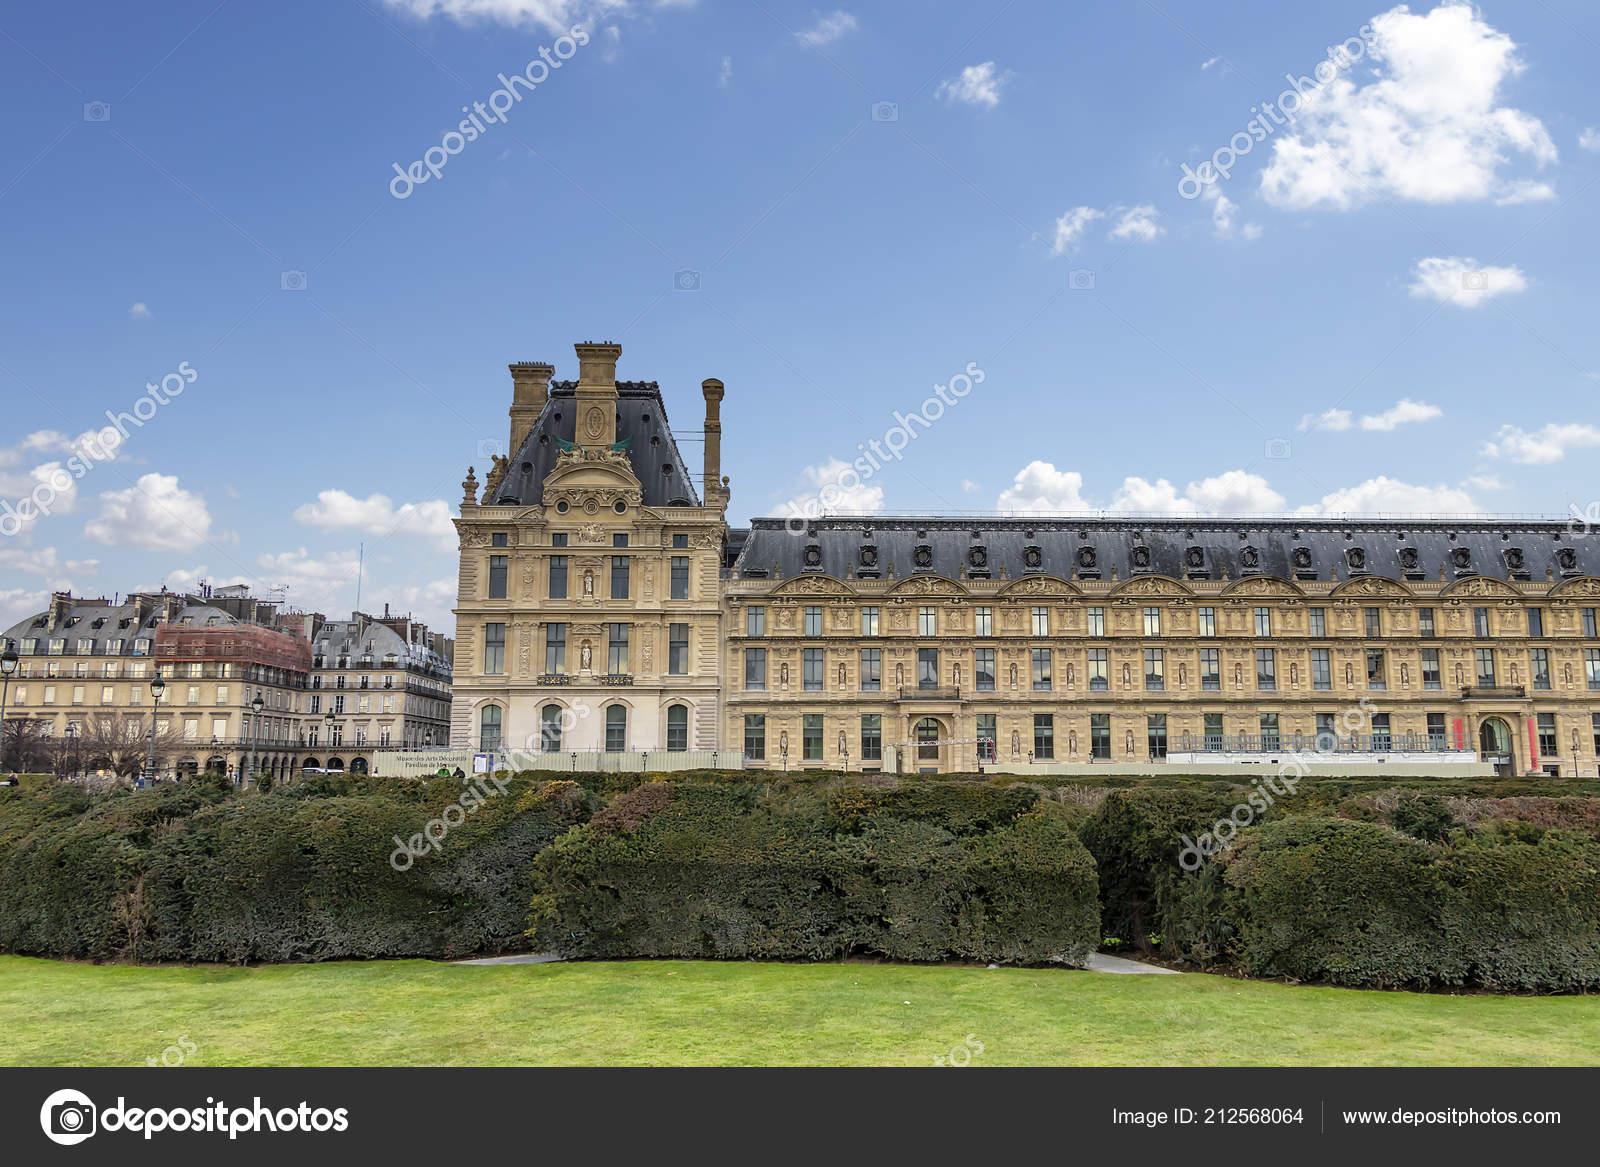 Das Nationalmuseum Fur Dekorative Kunst Paris Frankreich Stockfoto